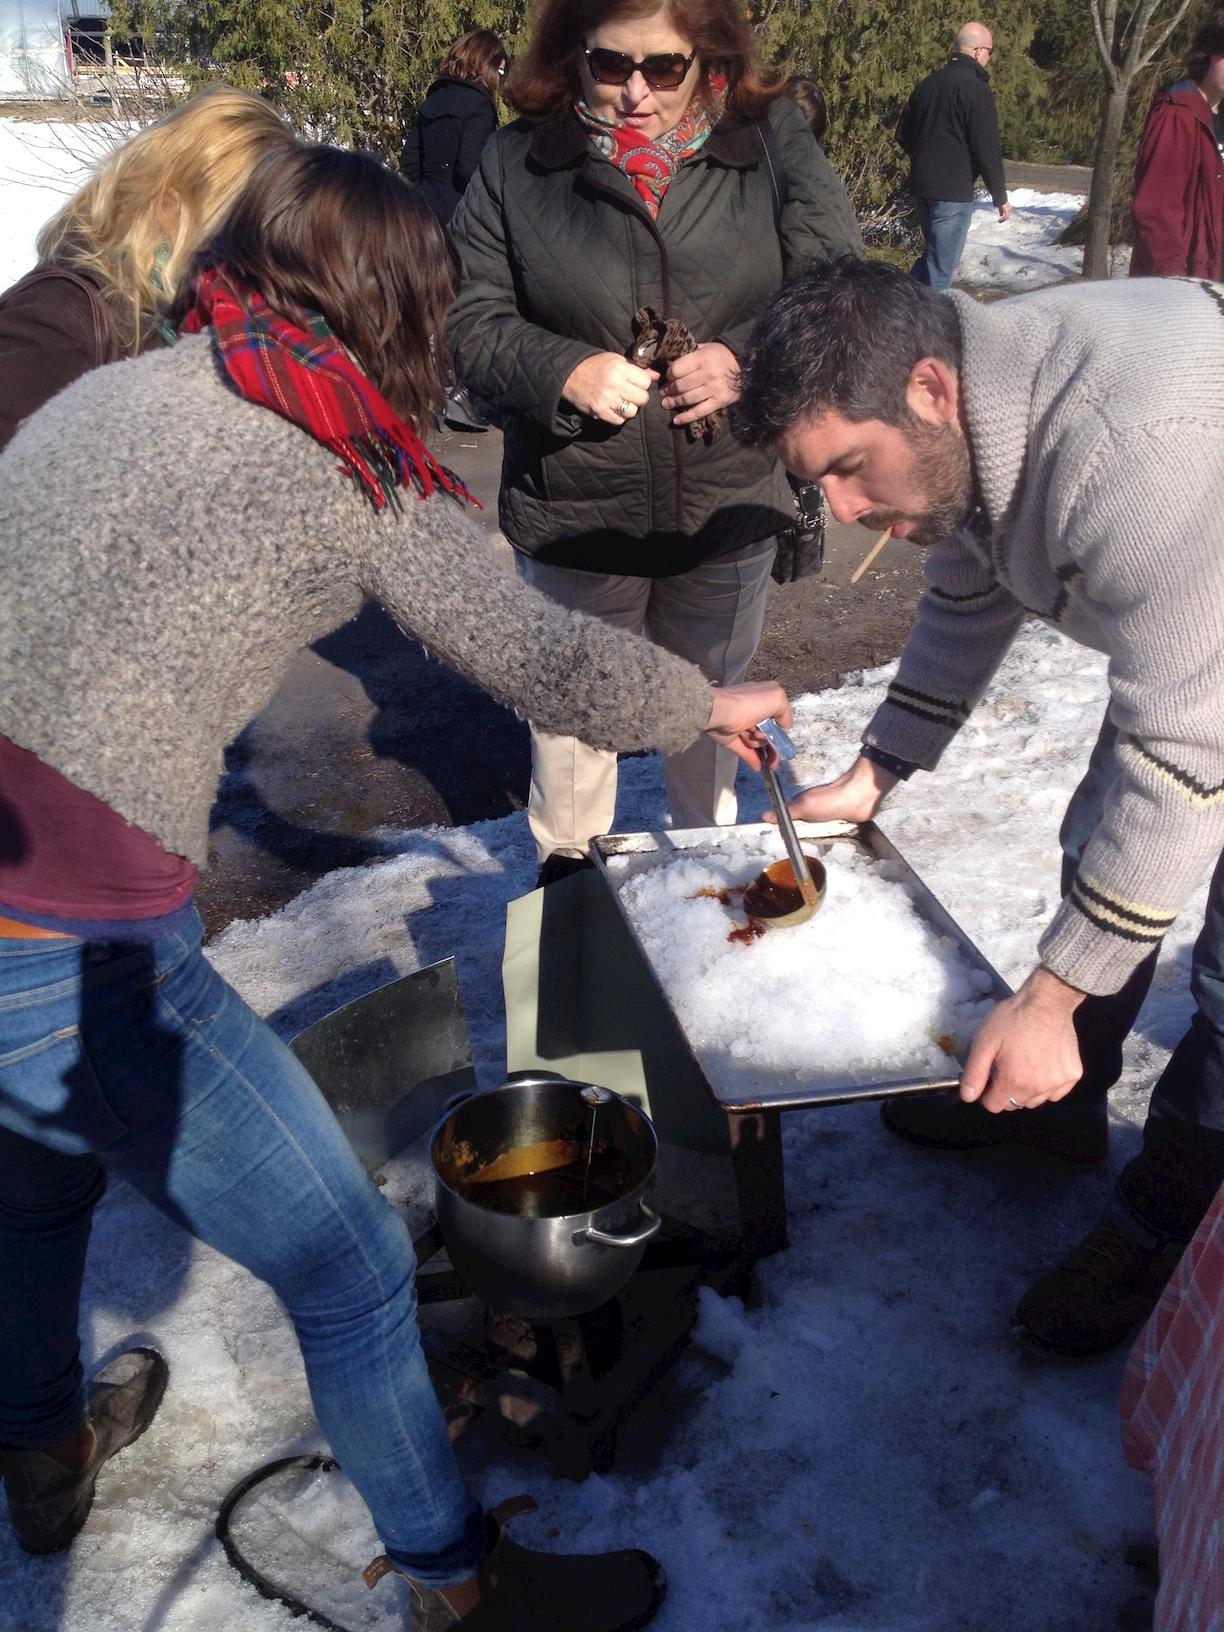 La Ferme ÄLska  owner  Genevieve   @alskafarm  and Andrew Gilbotawicz testing out her fresh maple taffy.